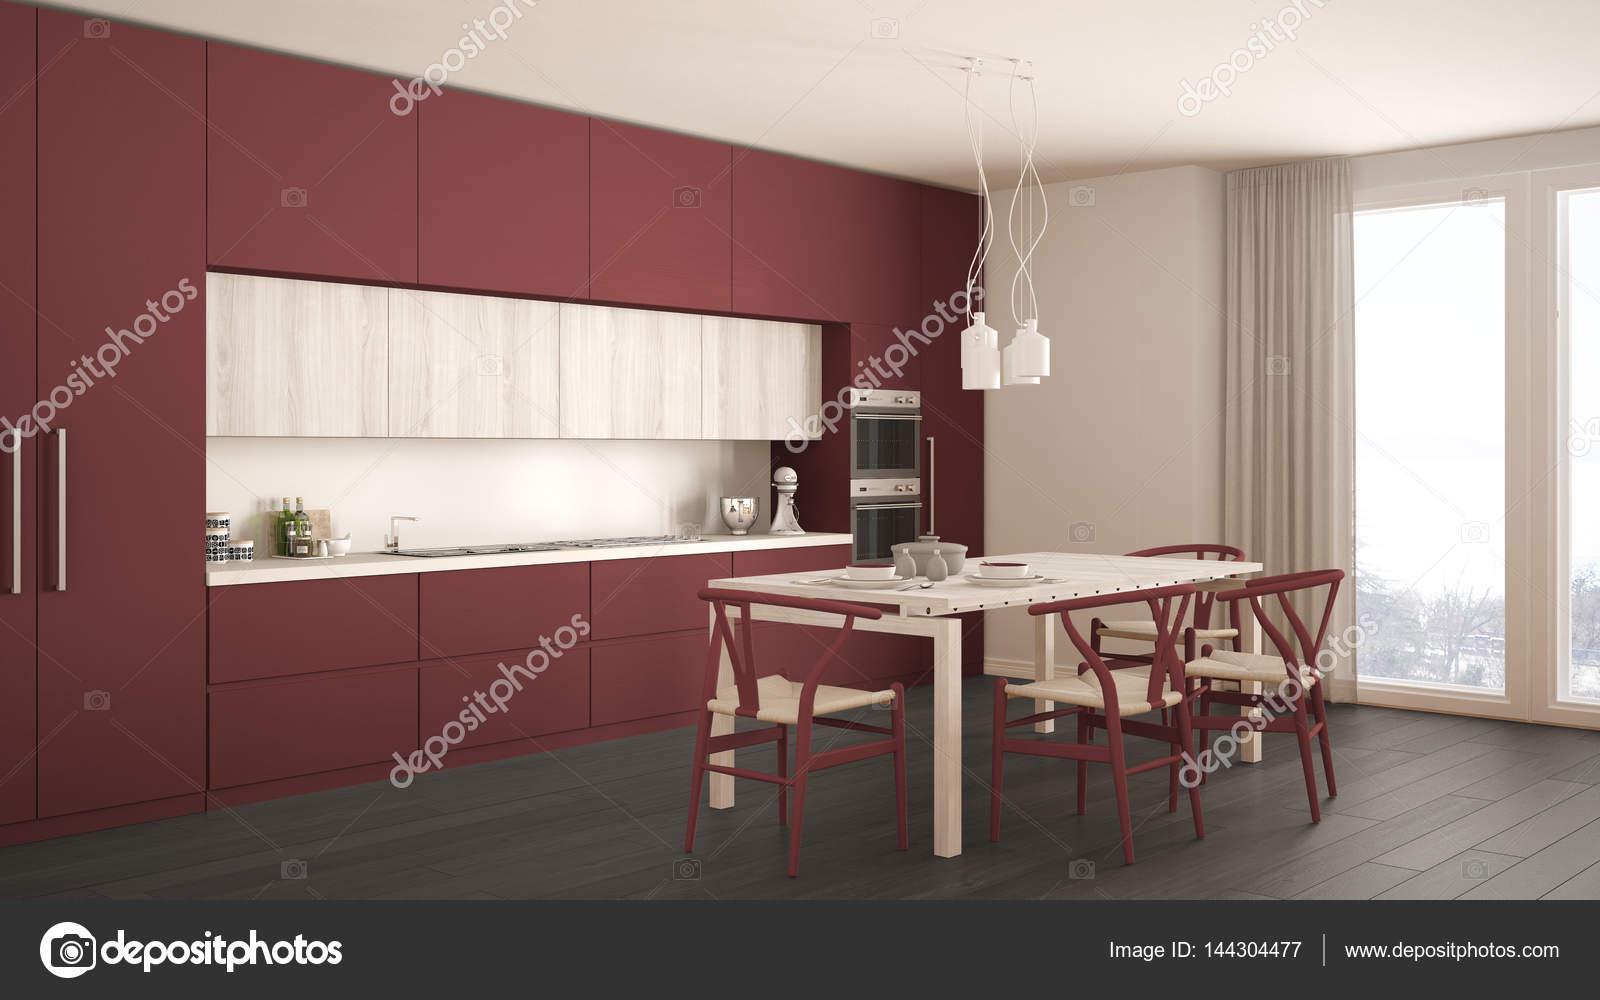 wood floors in kitchen aid products 现代最小红色厨房用木地板 经典室内d 图库照片 c archiviz 144304477